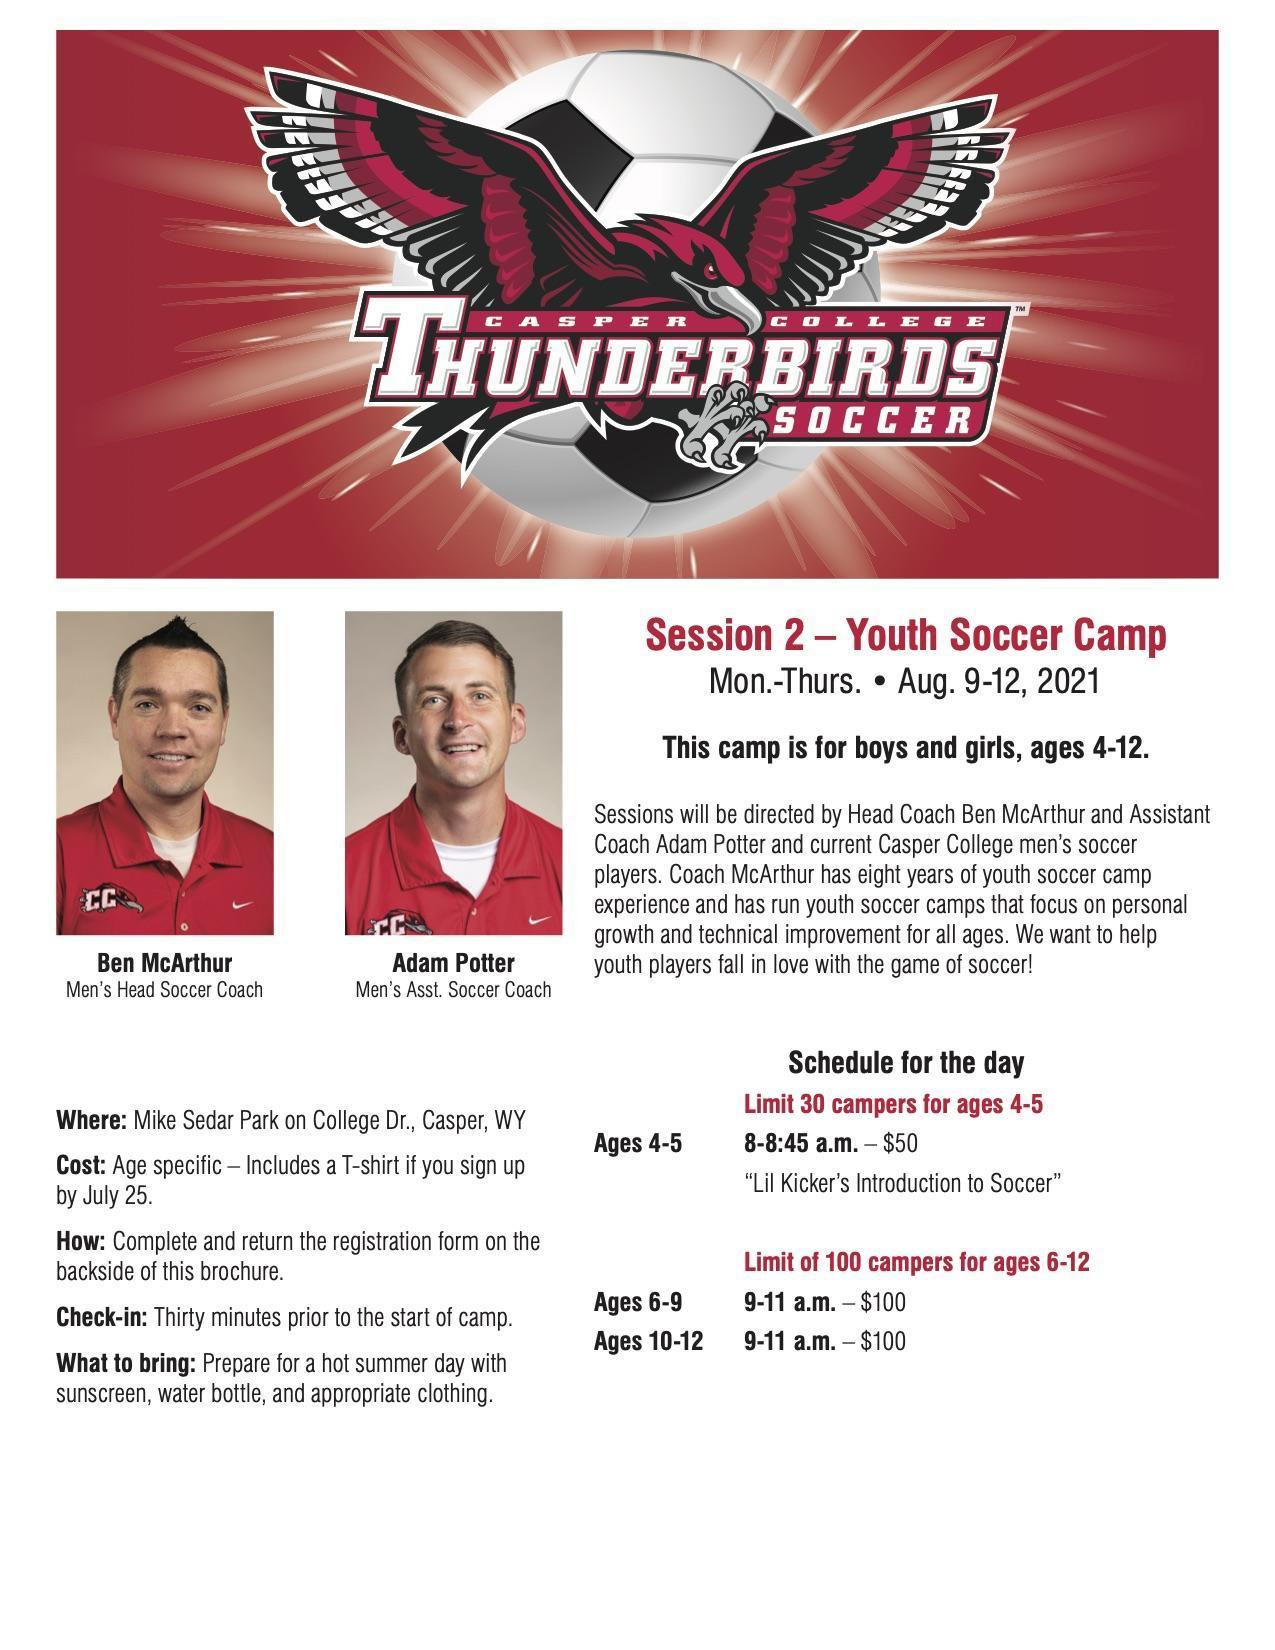 Casper College youth soccer camp flyer